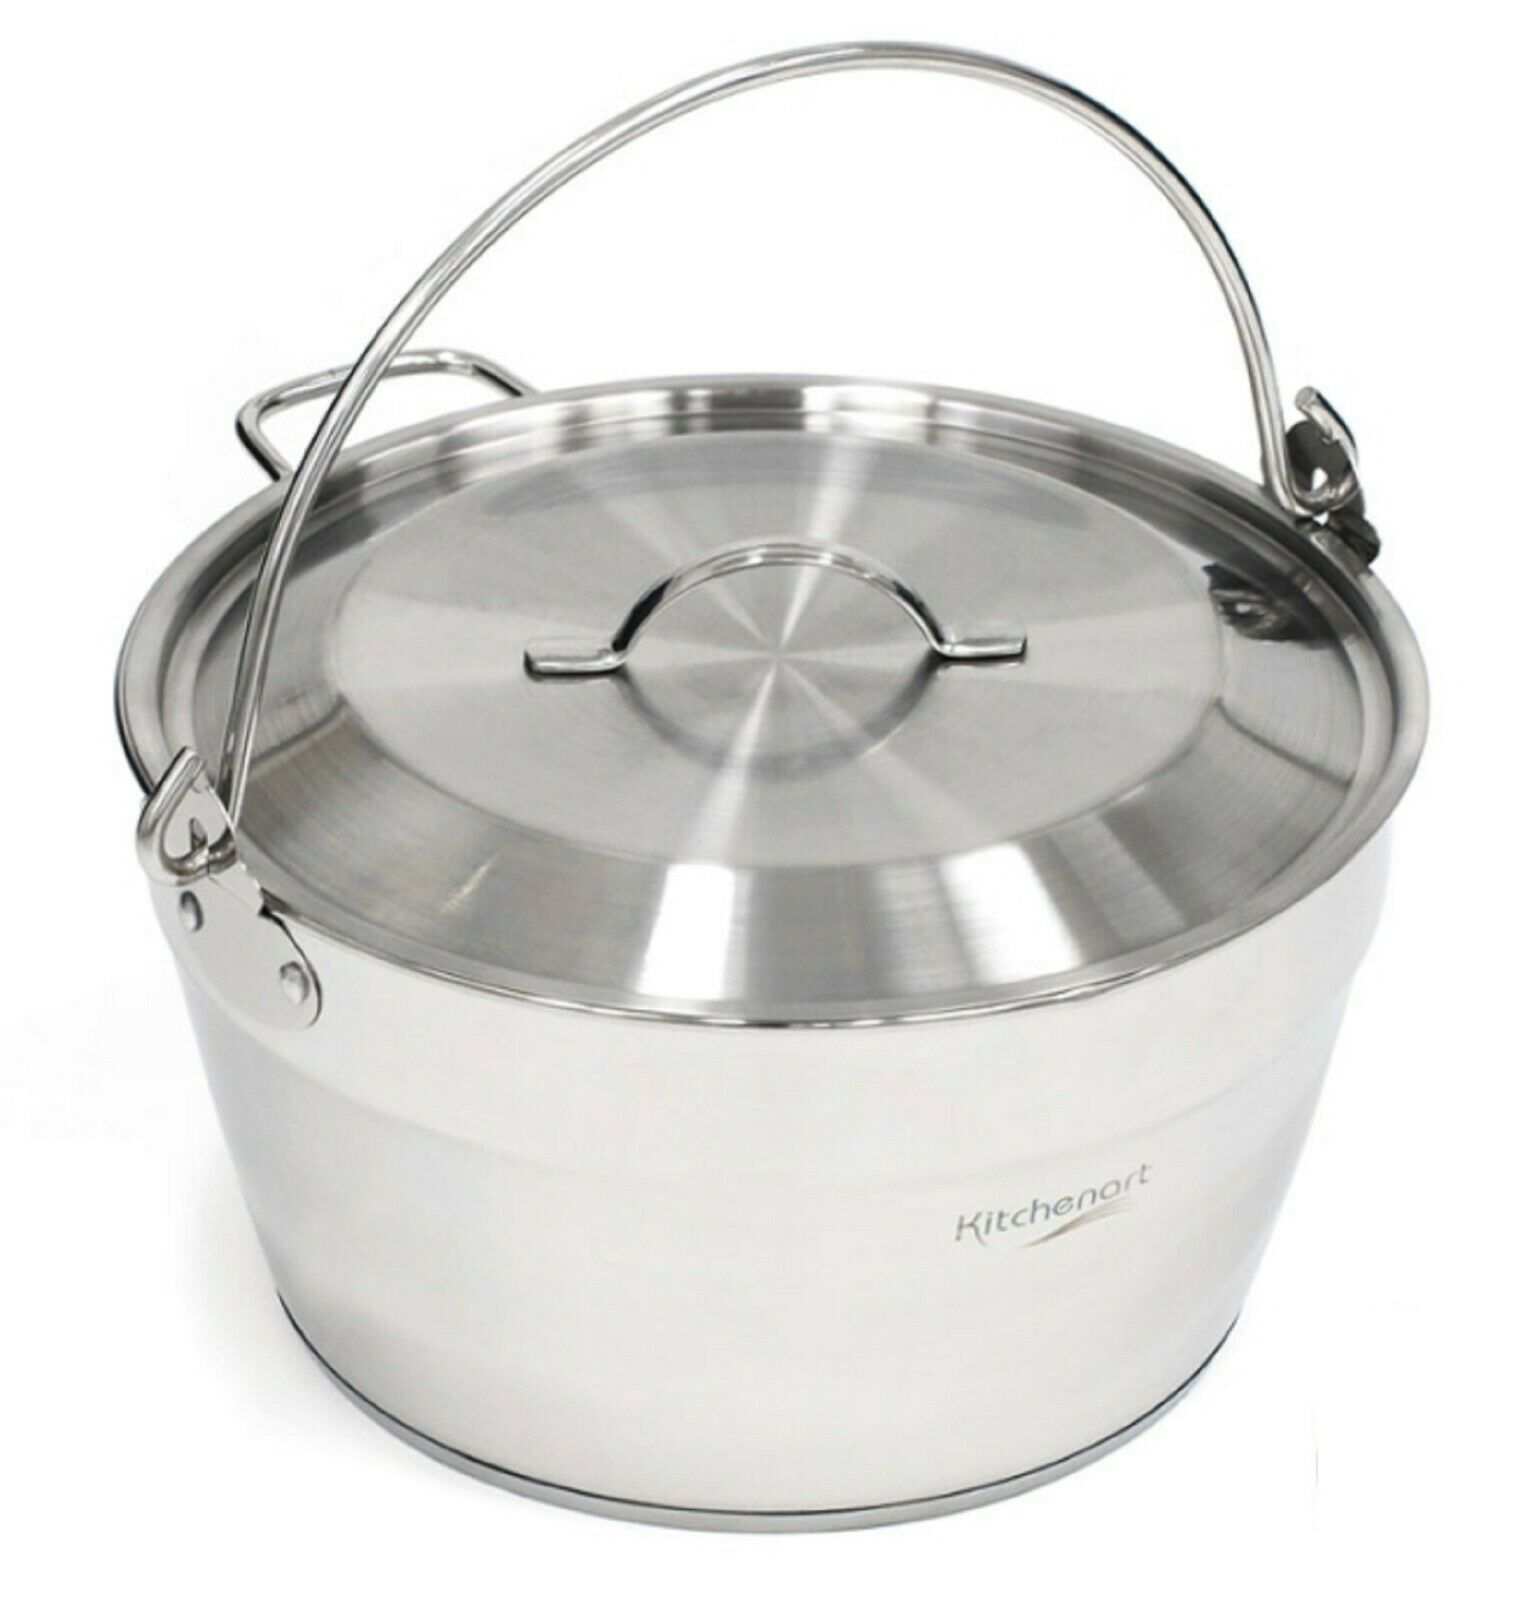 Kichenart Stainless Steel Induction Jam Pot Bucket Multipot Basket 9L (Lid)